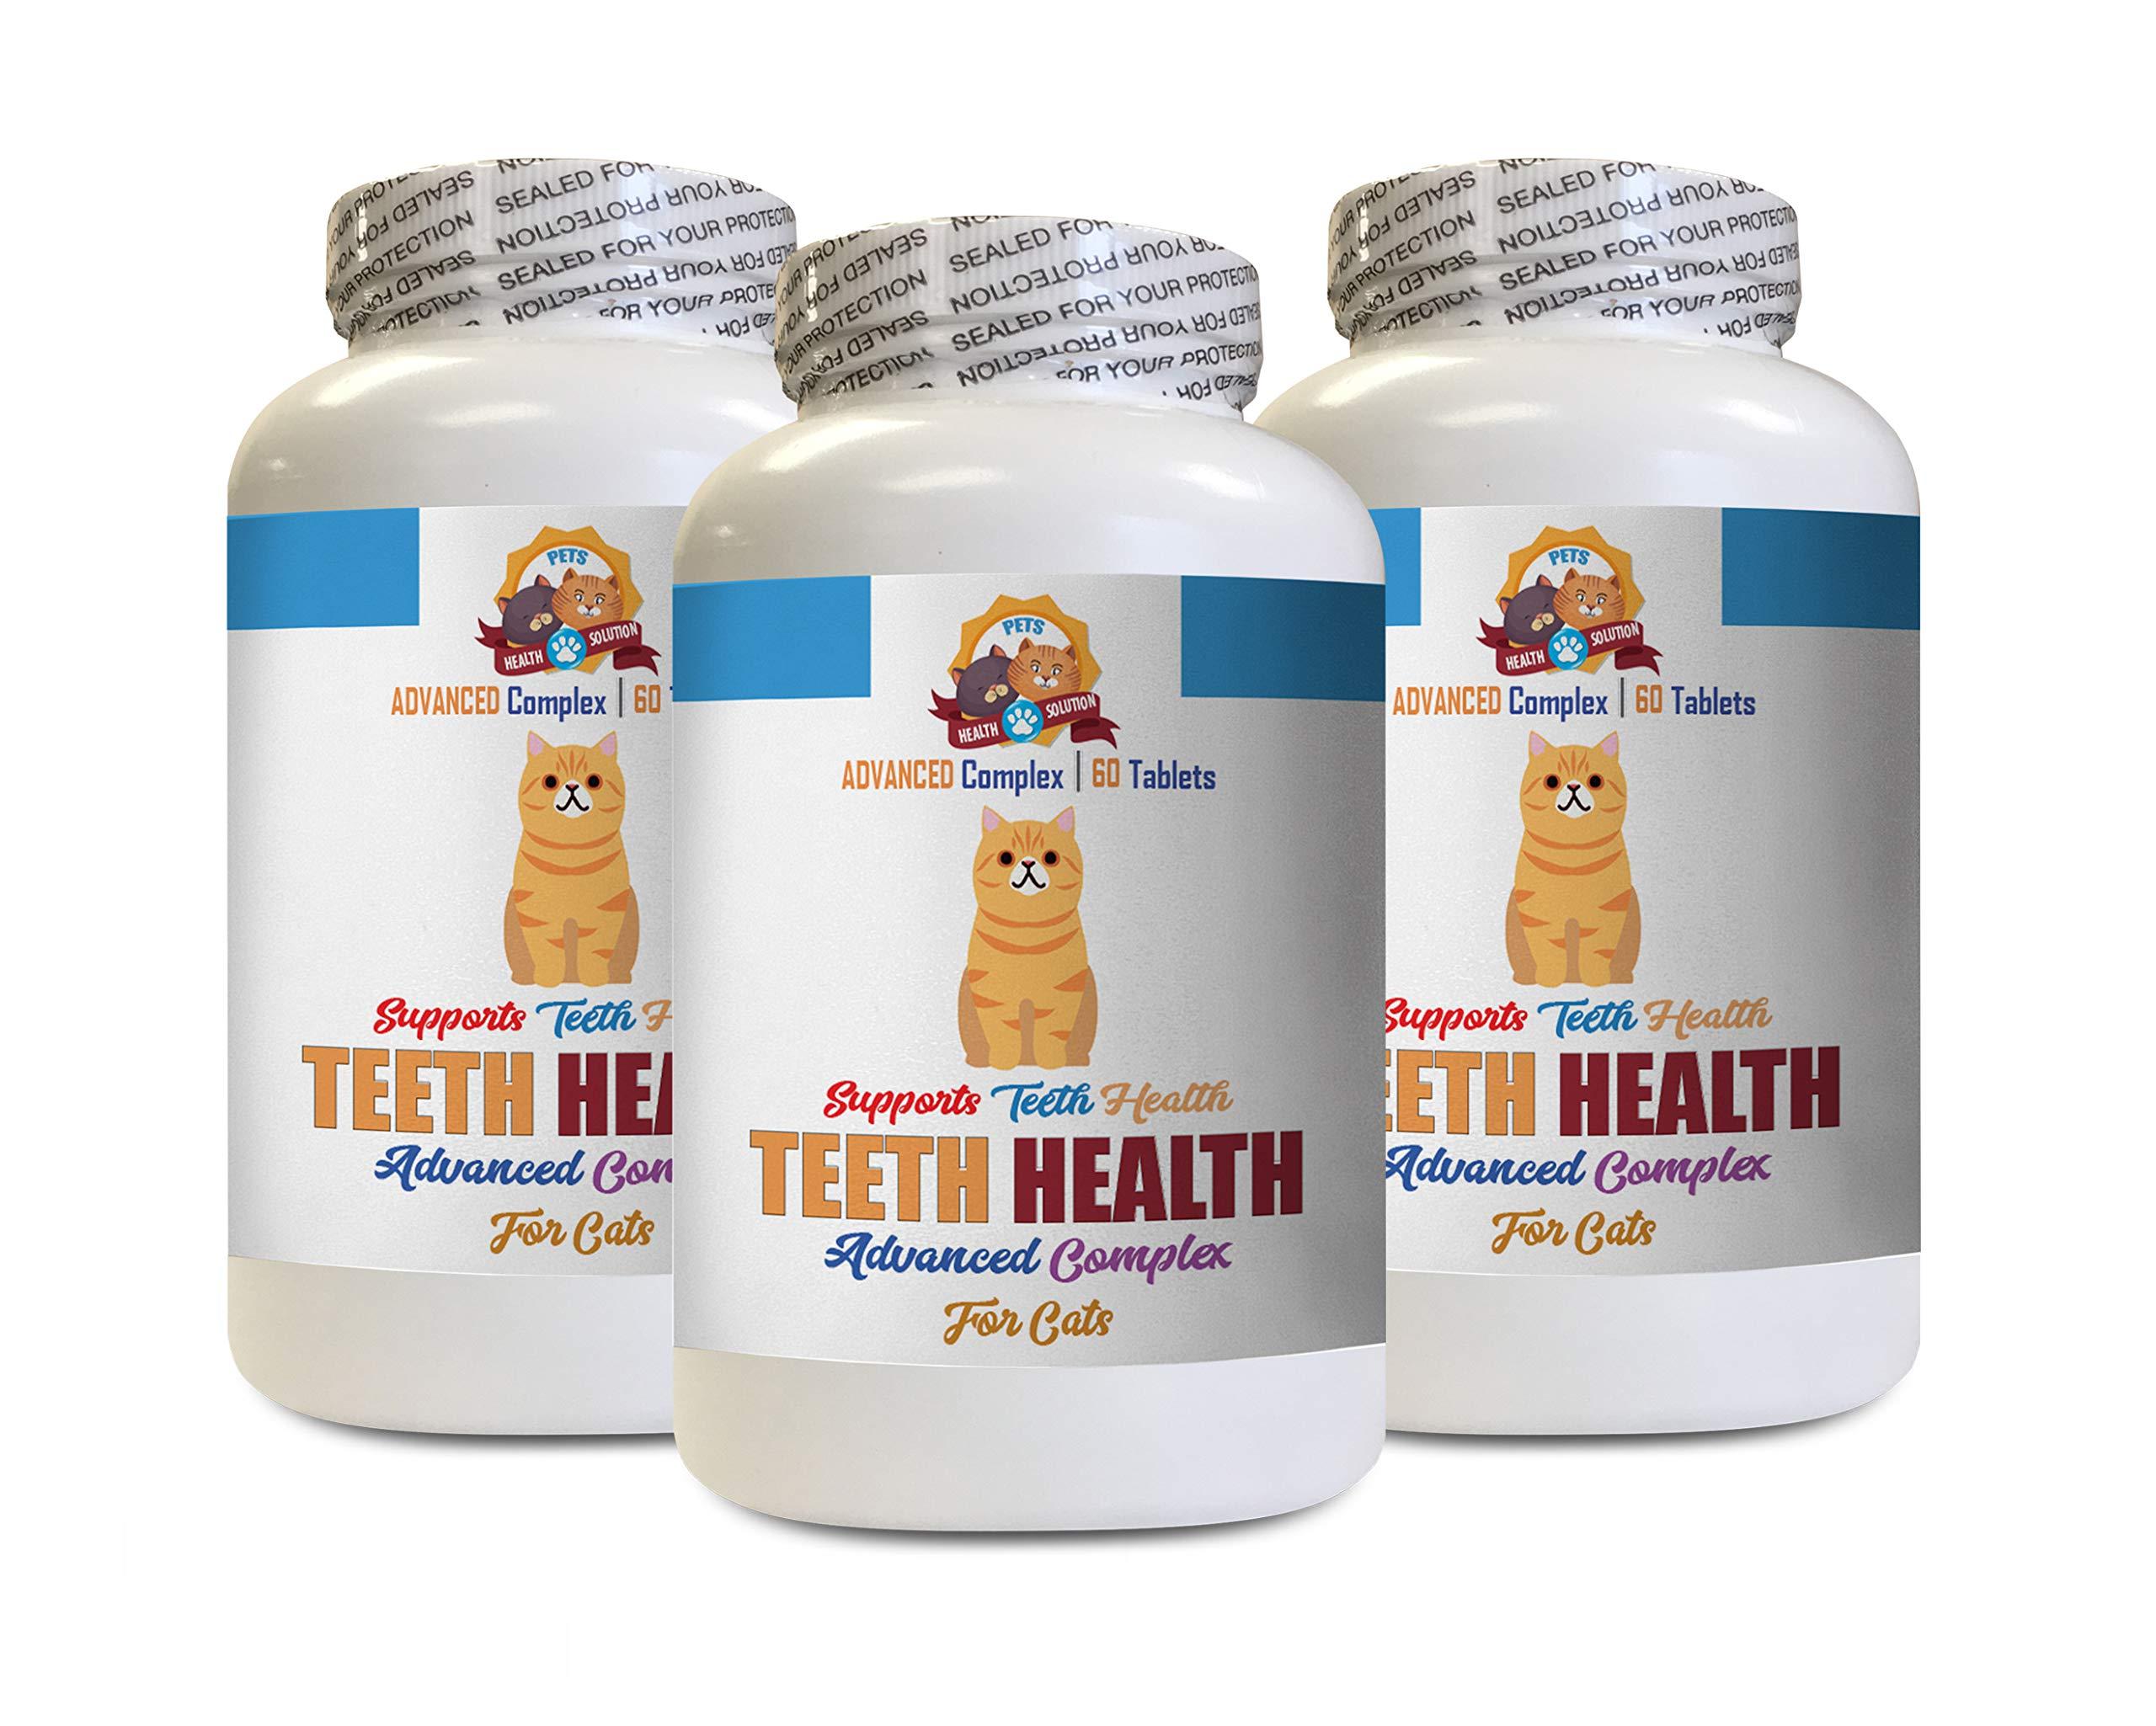 cat Dental Care Solution - Cats Teeth Health Complex - Advanced Gum Mouth Bad Breath Health Formula - Kitty Vitamin - 180 Tablets (3 Bottles)